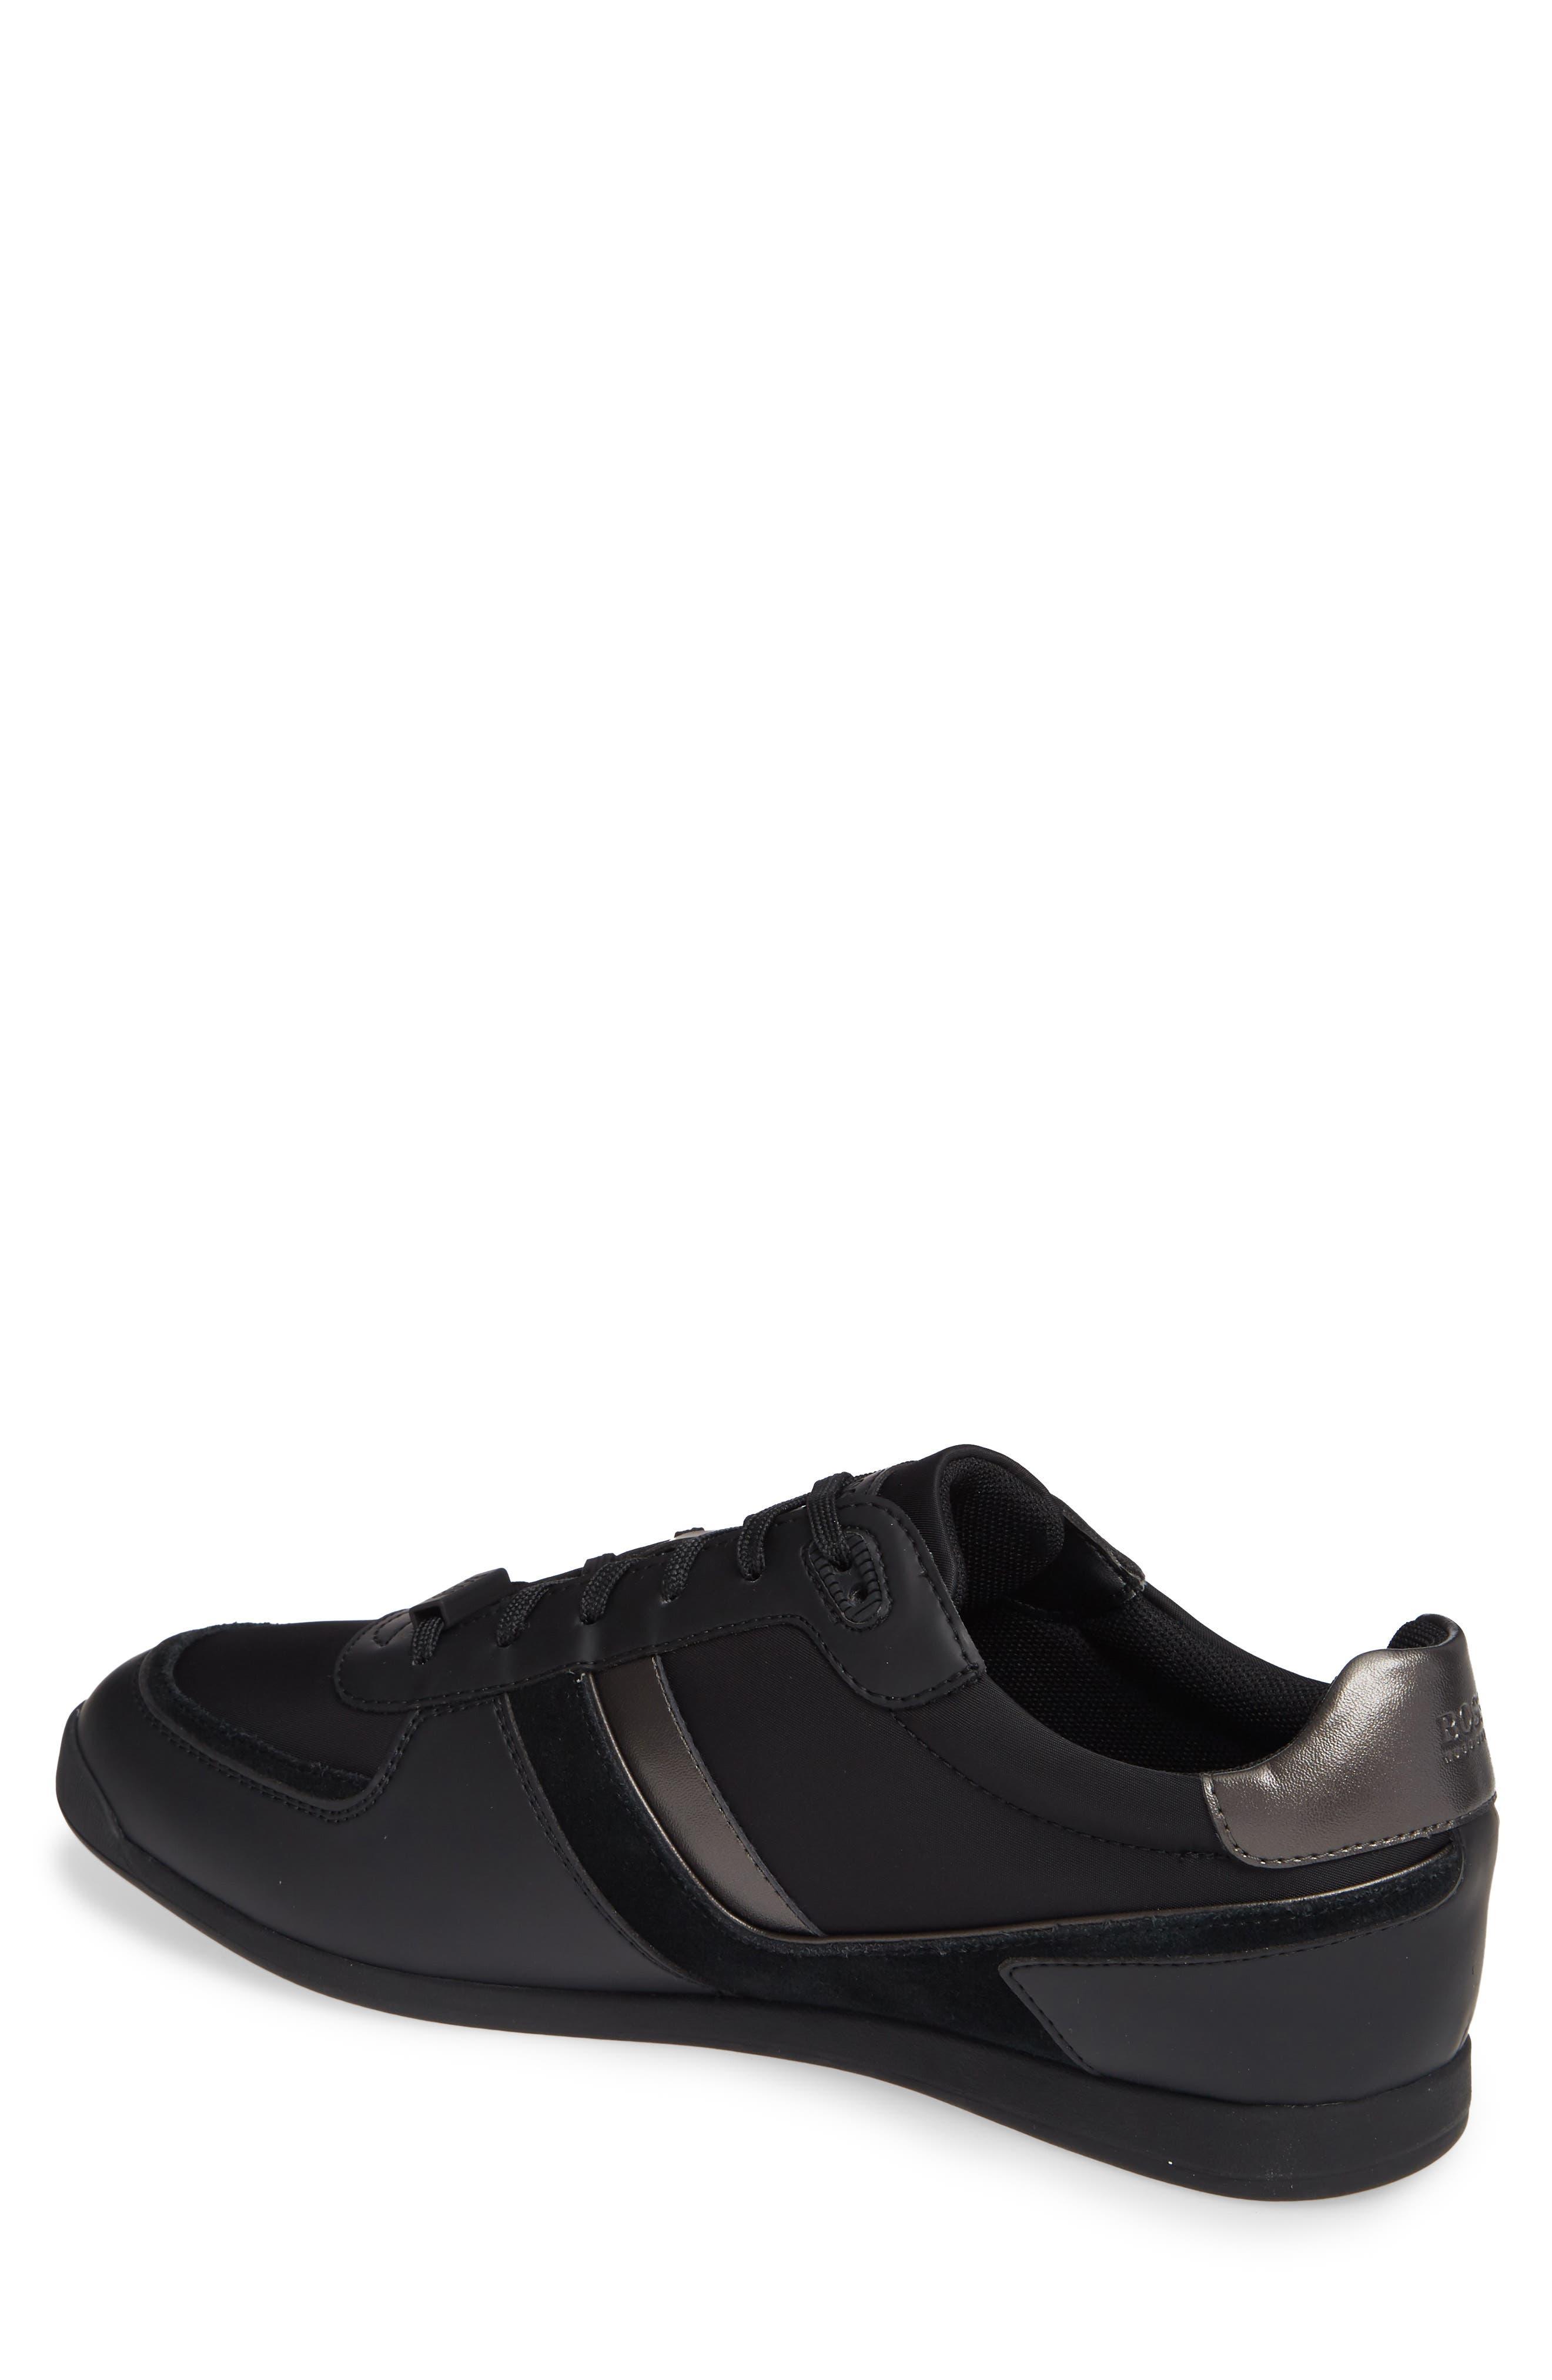 Maze Sneaker,                             Alternate thumbnail 2, color,                             BLACK